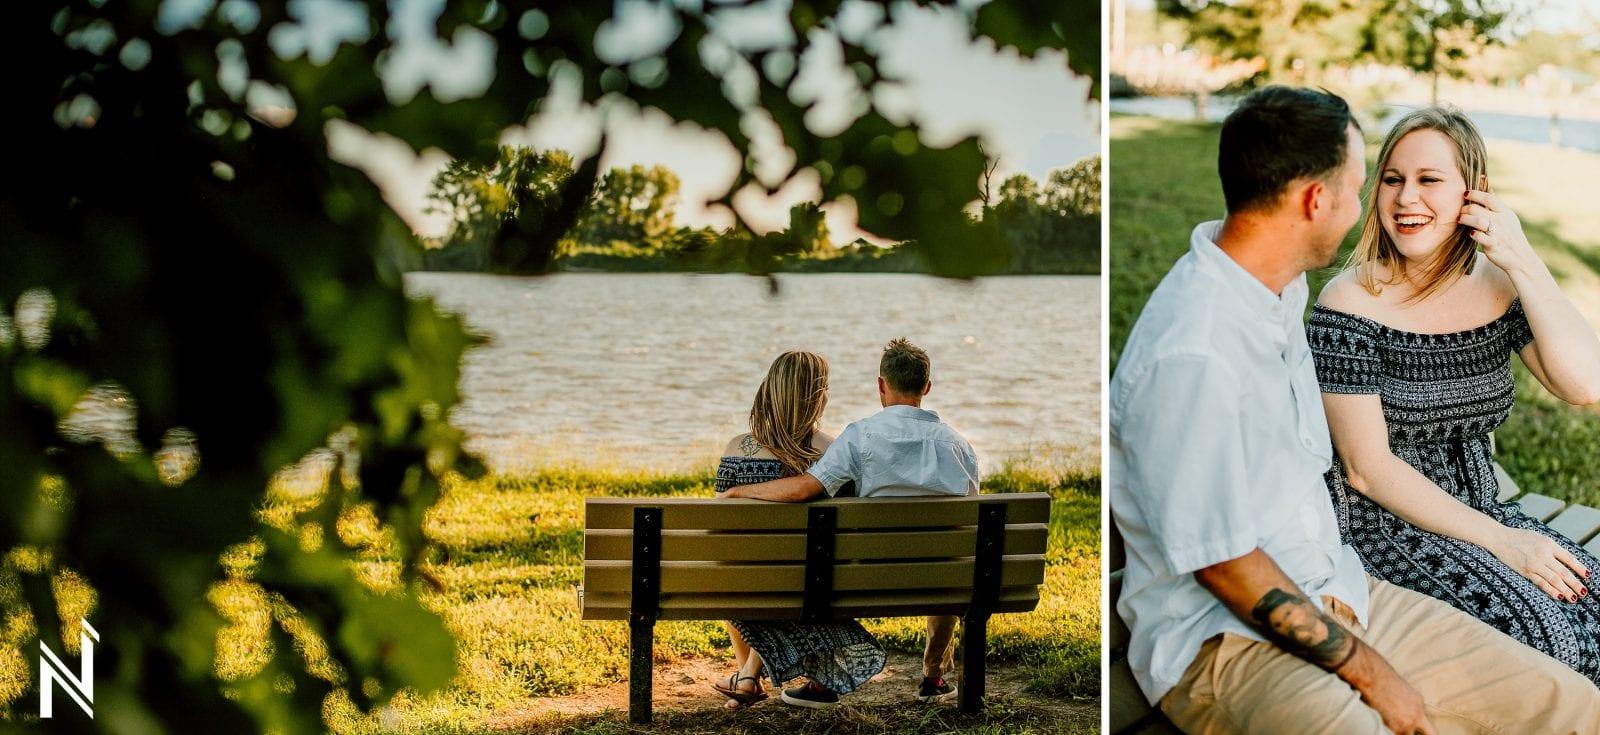 Engagement photos at Westport Social and Creve Coeur Lake in St. Louis, Missouri